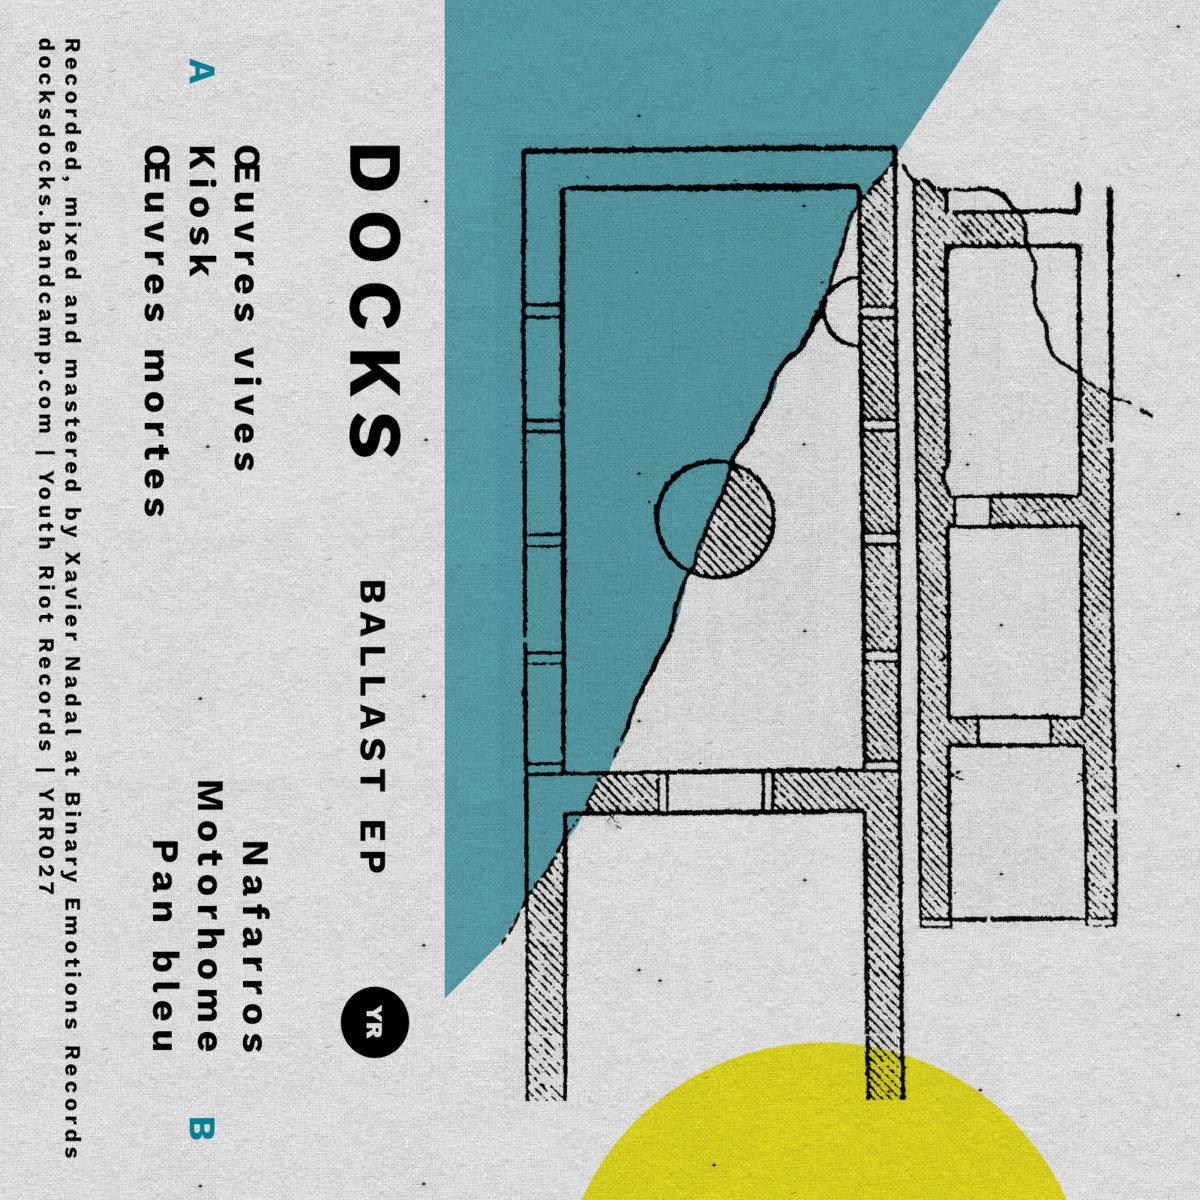 docks ballast EP